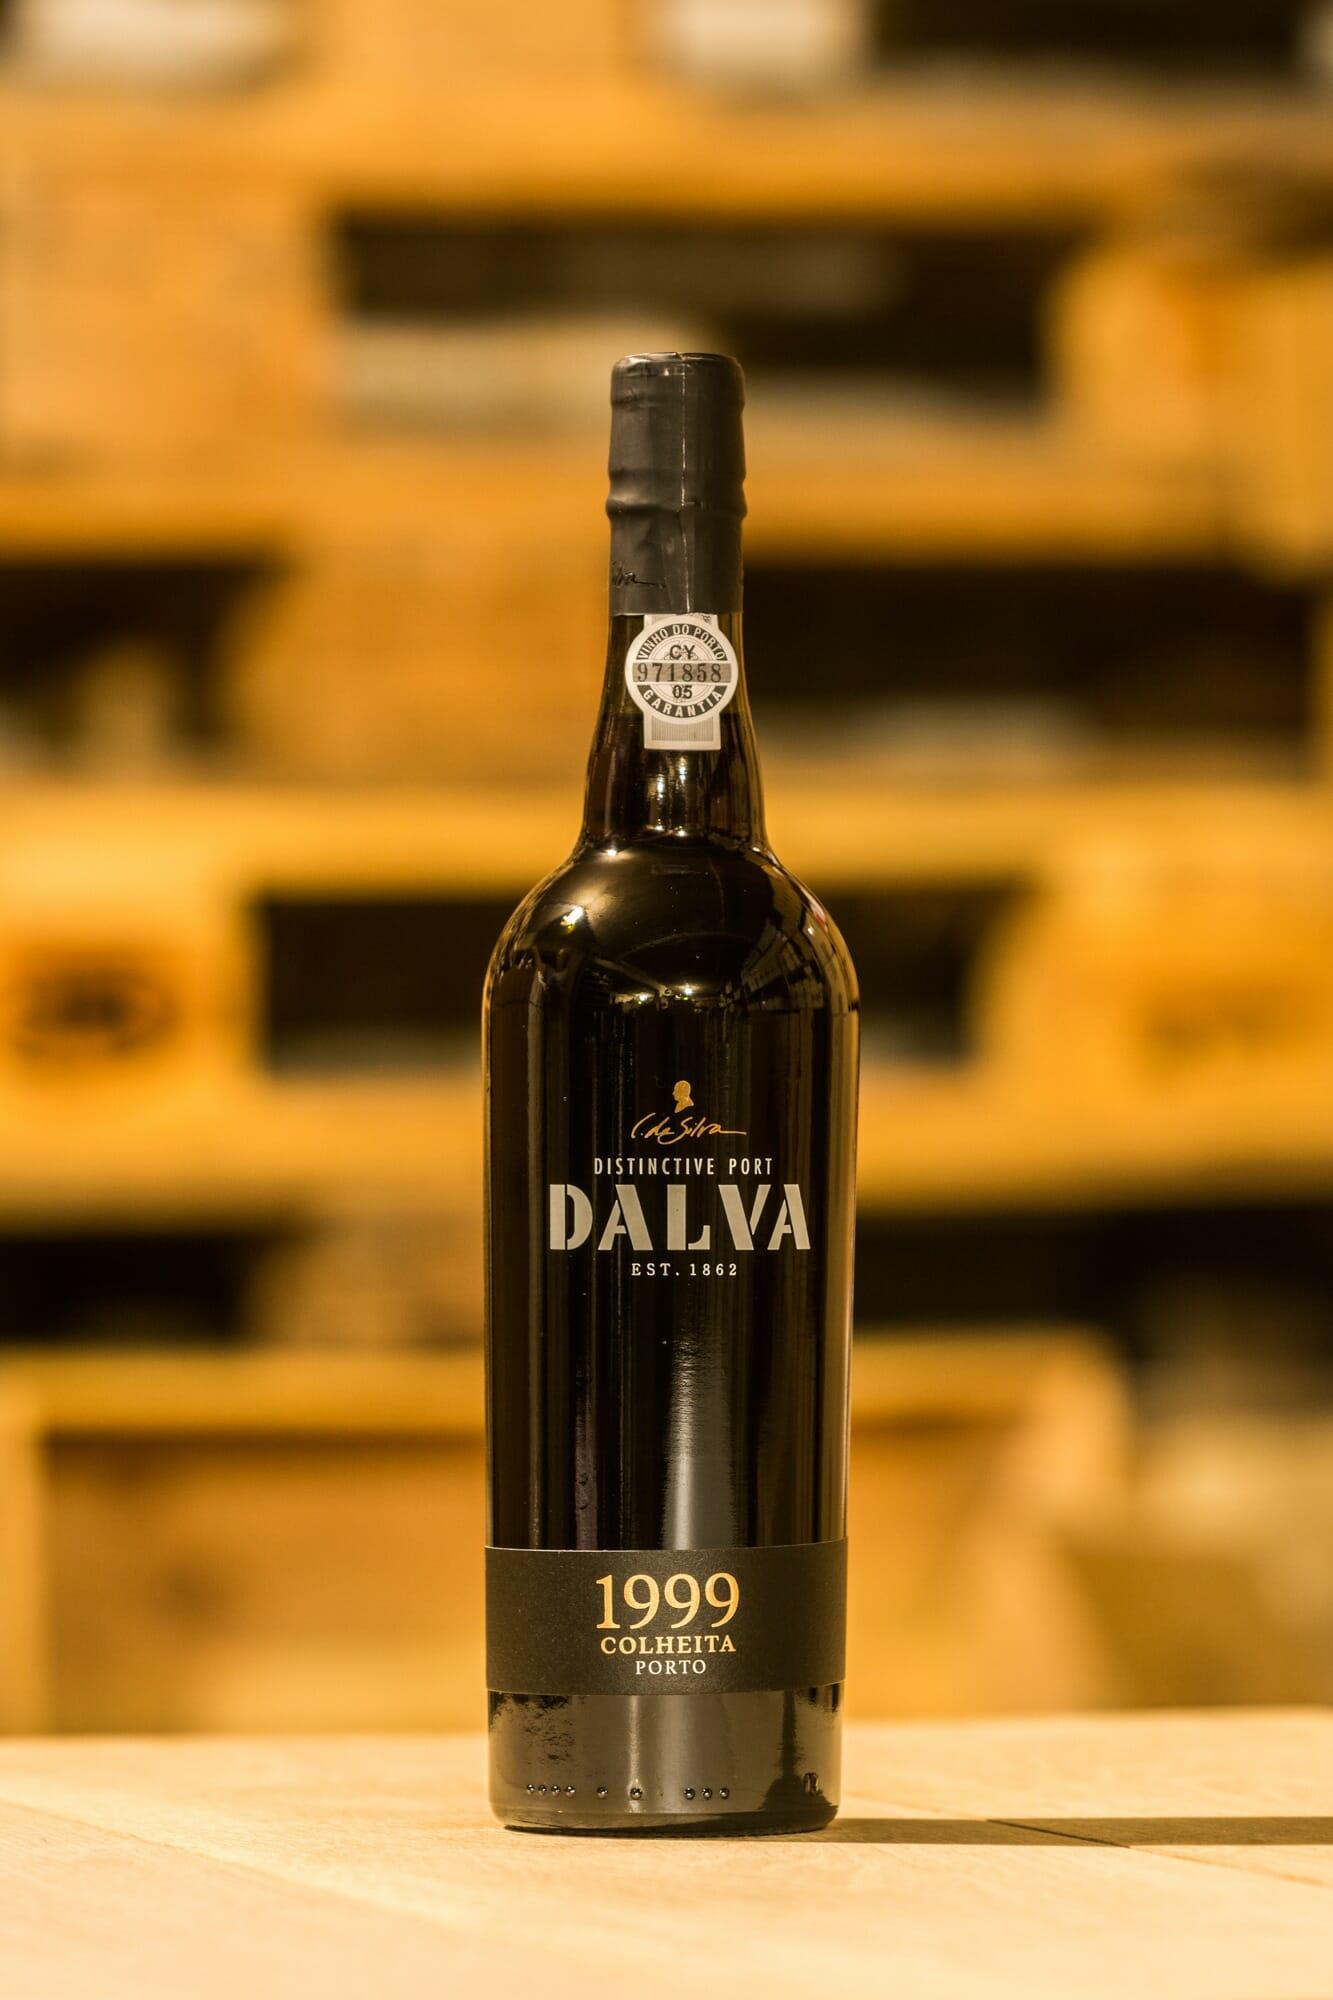 C. da Silva Dalva Colheita Port 1999